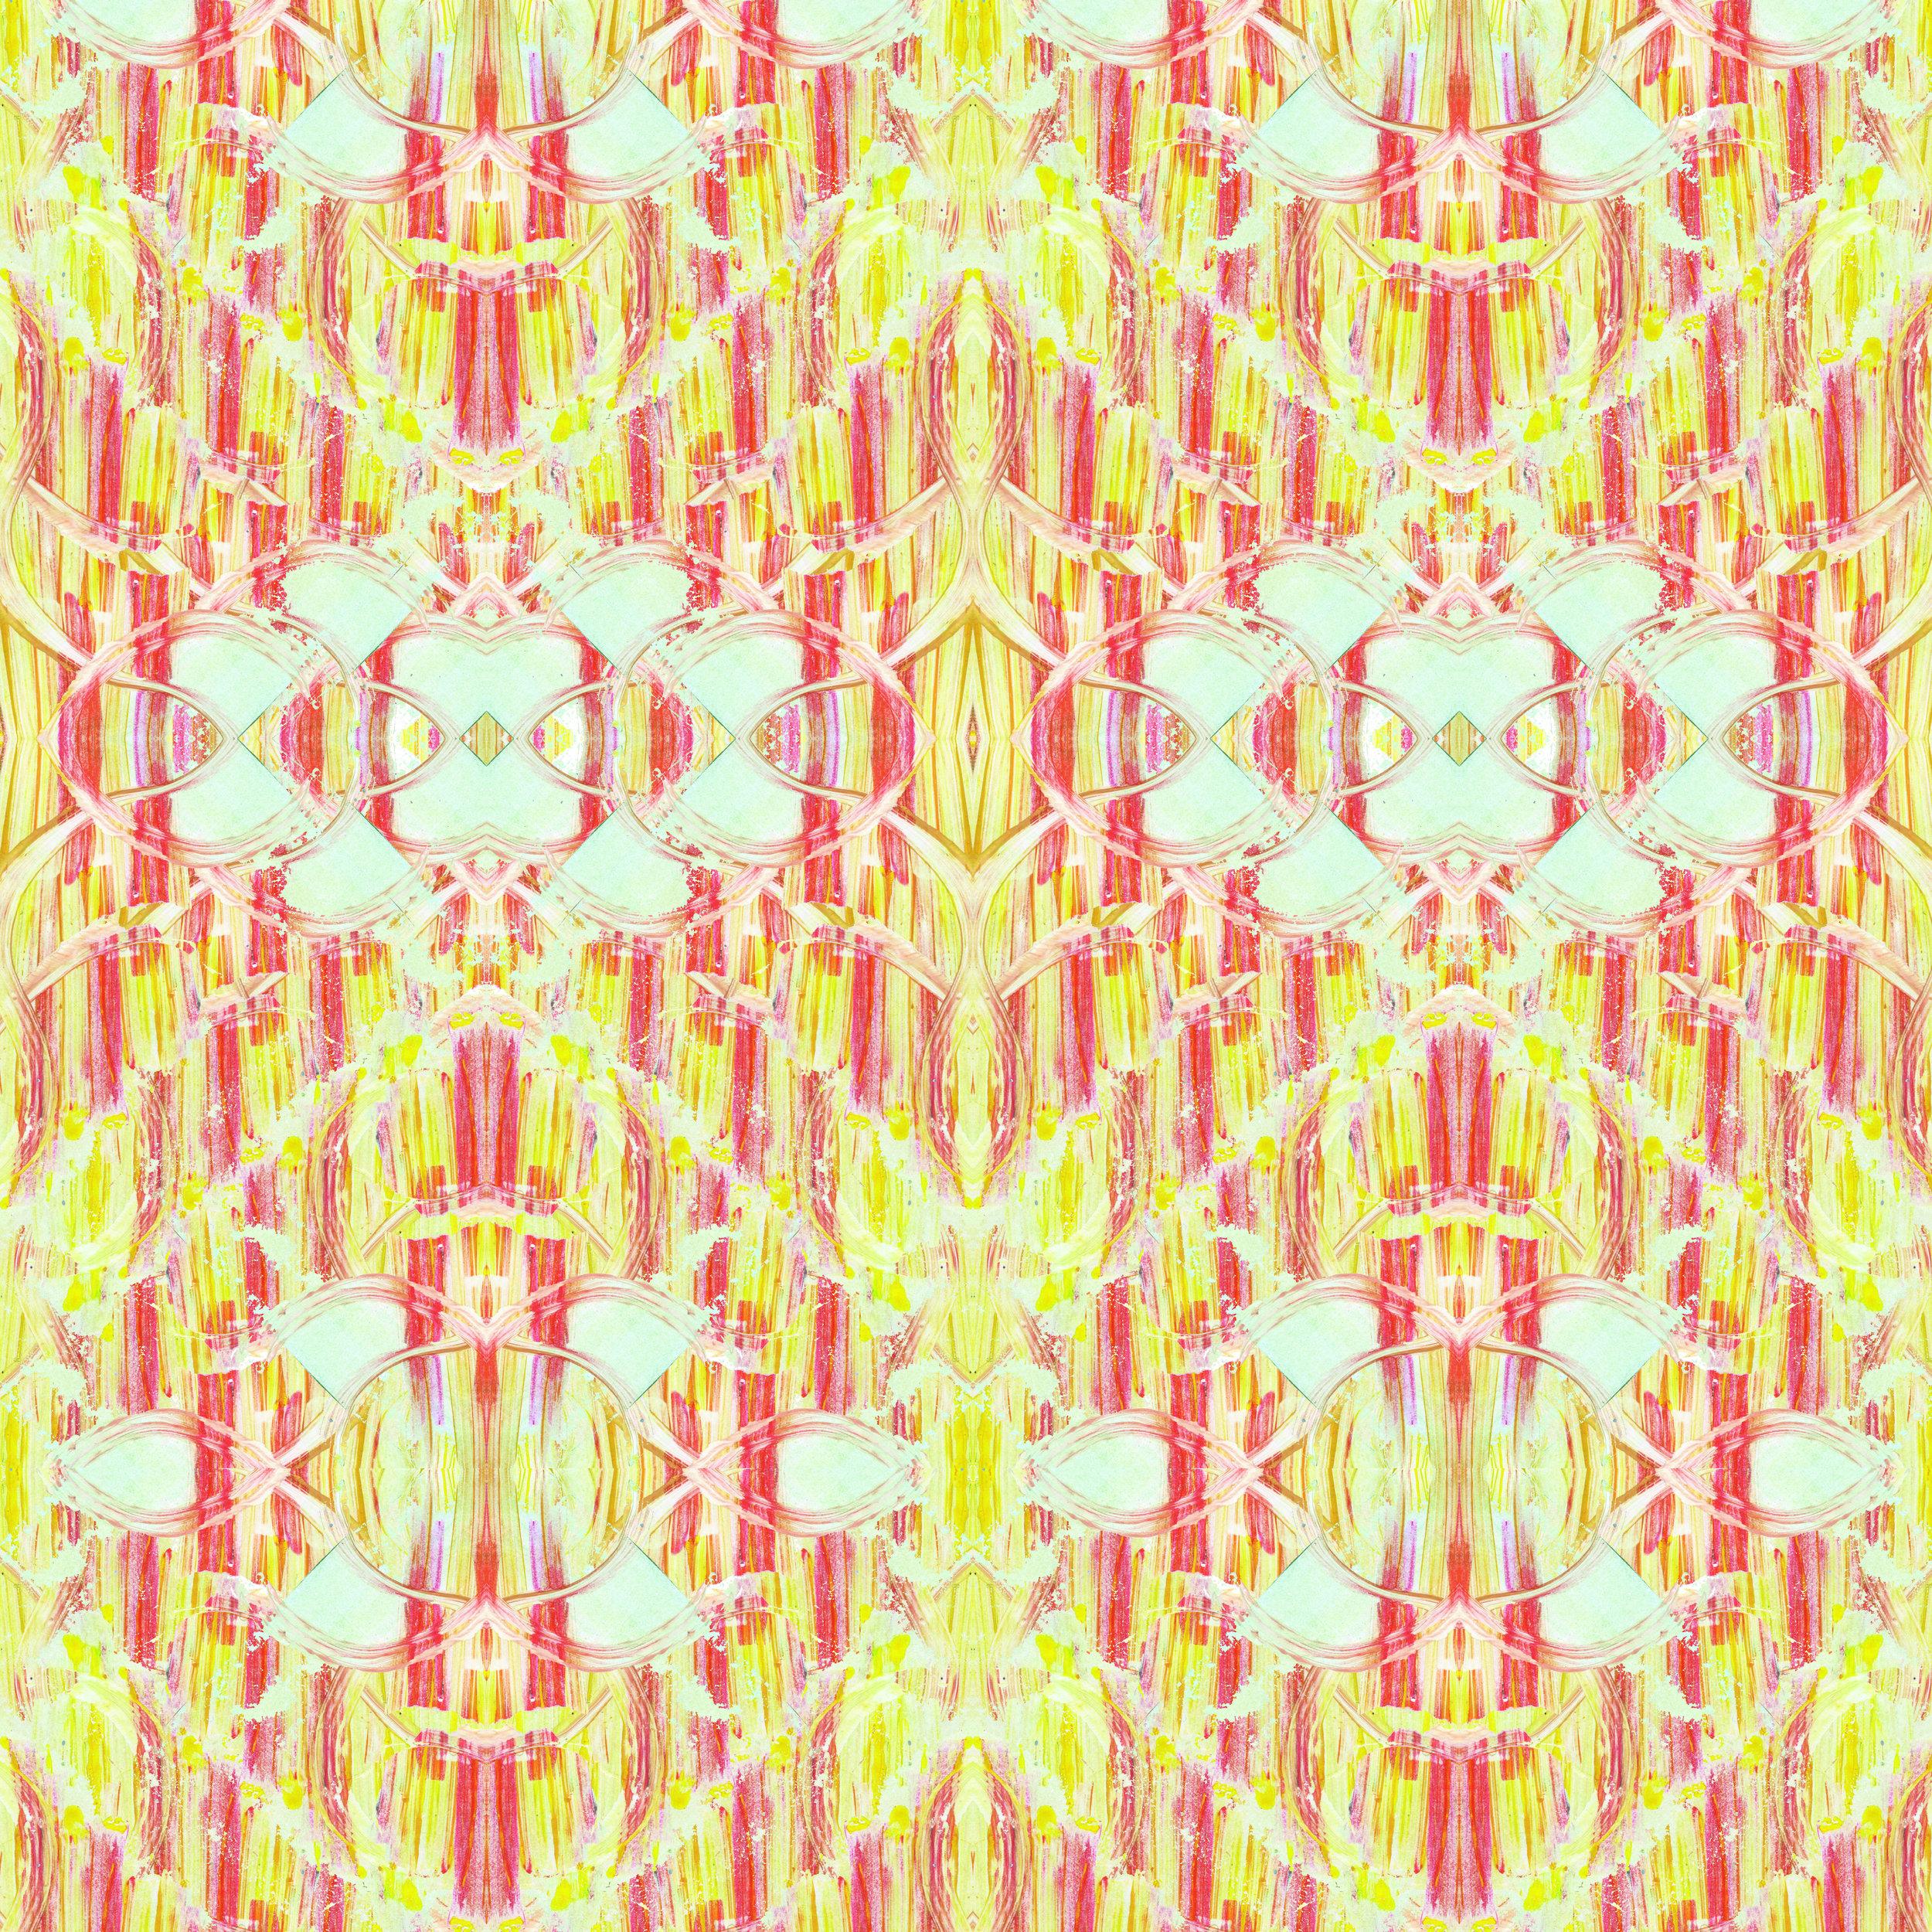 pattern_6.1.jpg